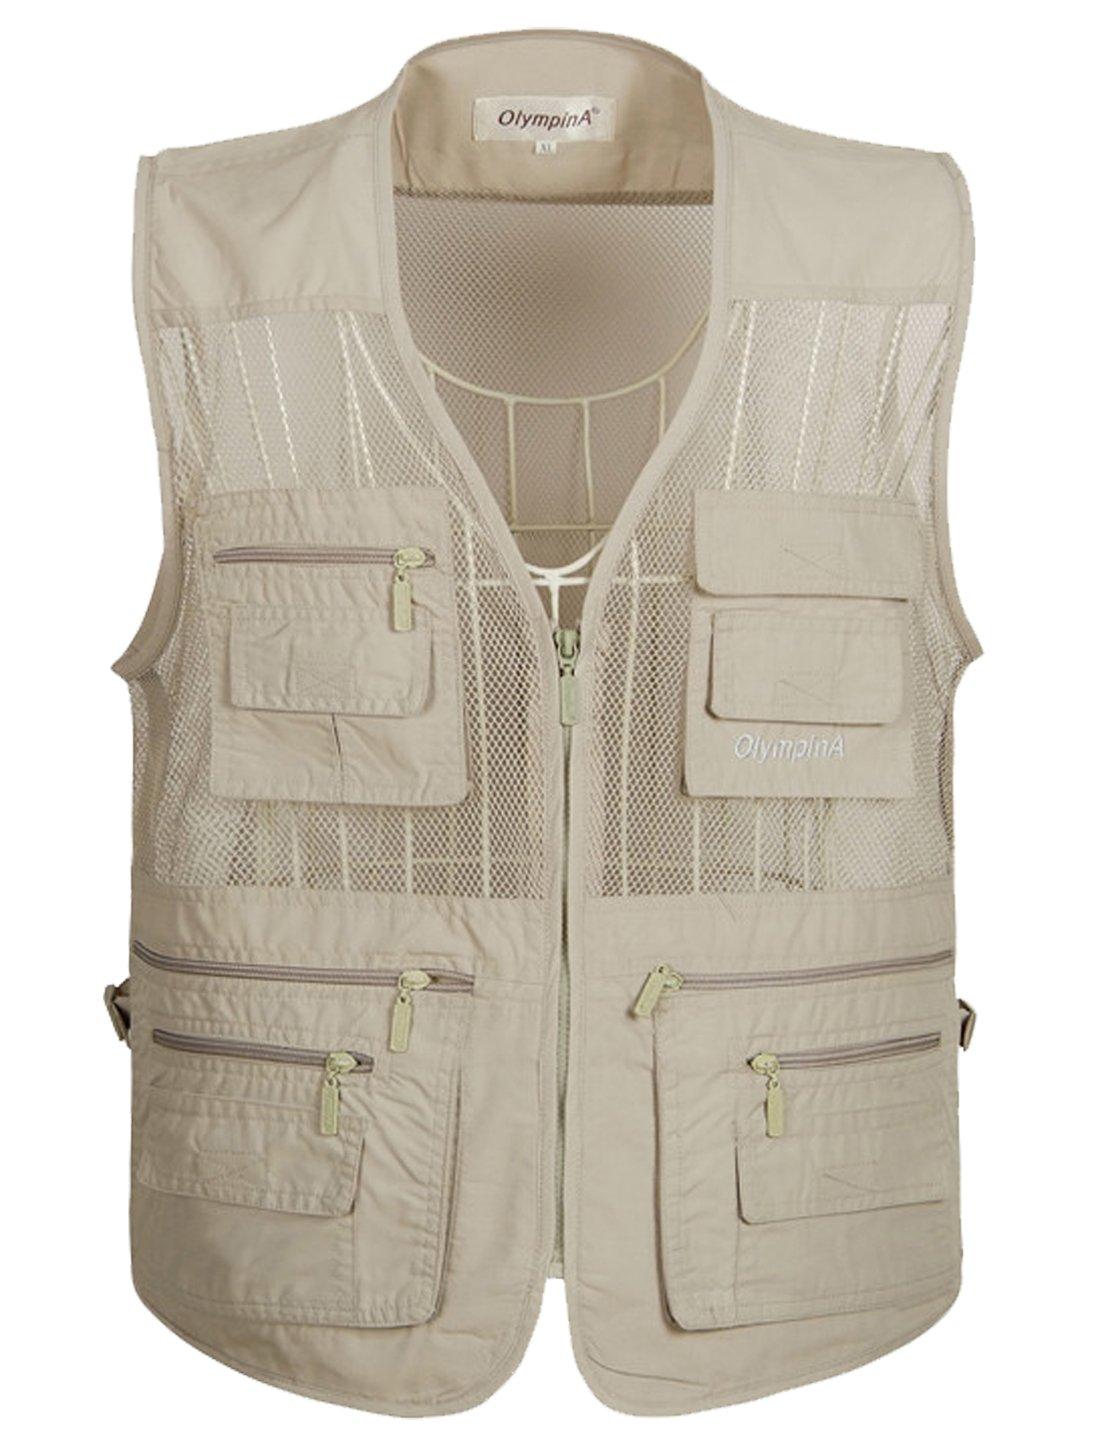 Flygo Men's Summer Mesh Fishing Vest Photography Work Multi-Pockets Outdoors Journalist's Vest Sleeveless Jacket (X-Large, Off White)